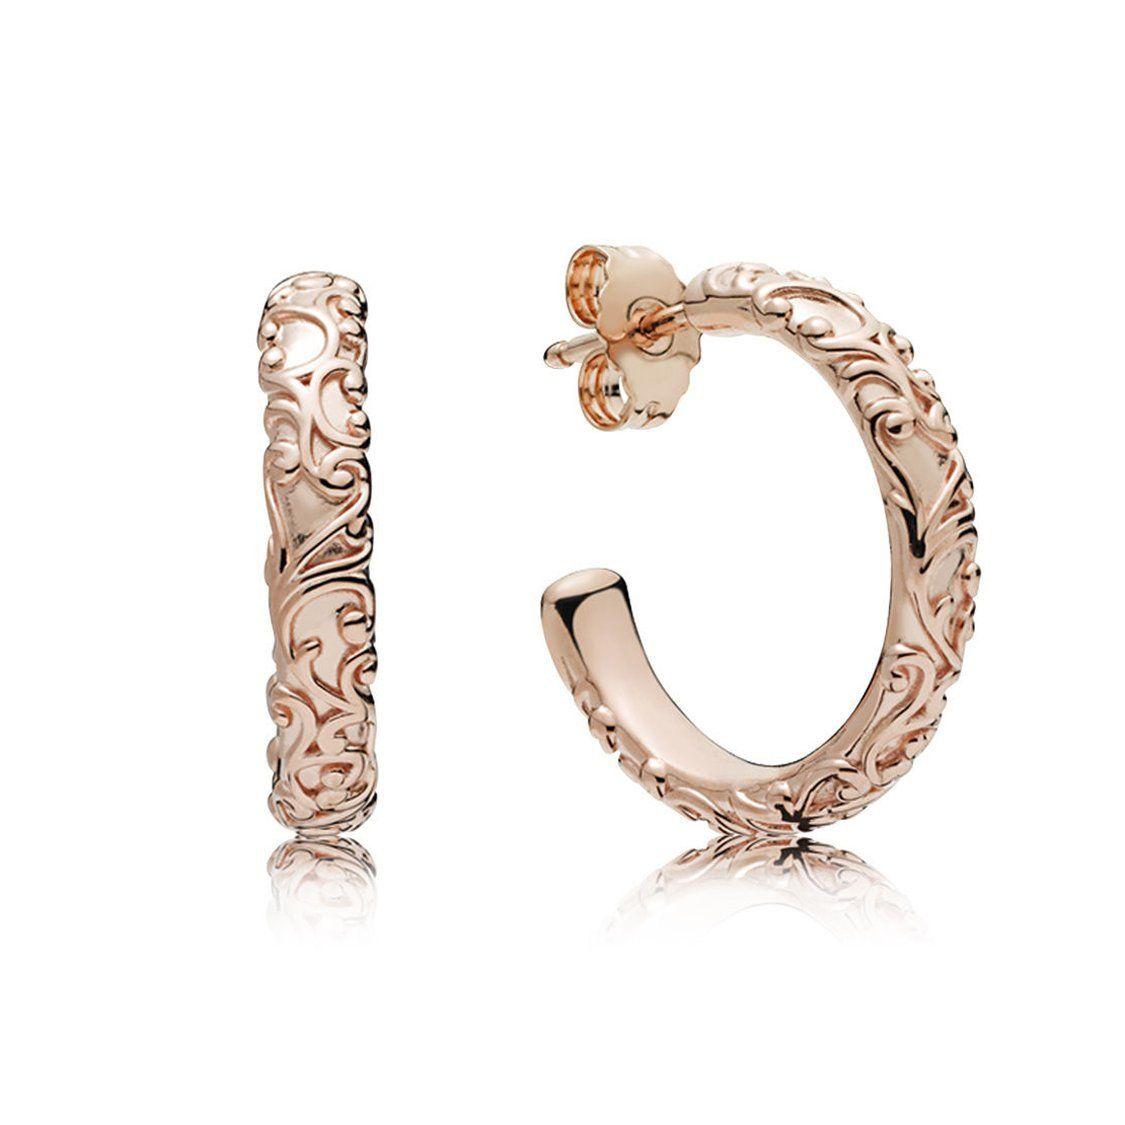 ac458963b 287732 Regal Hoop Earrings In Pandora Rose | j e w e l r y | Pandora ...